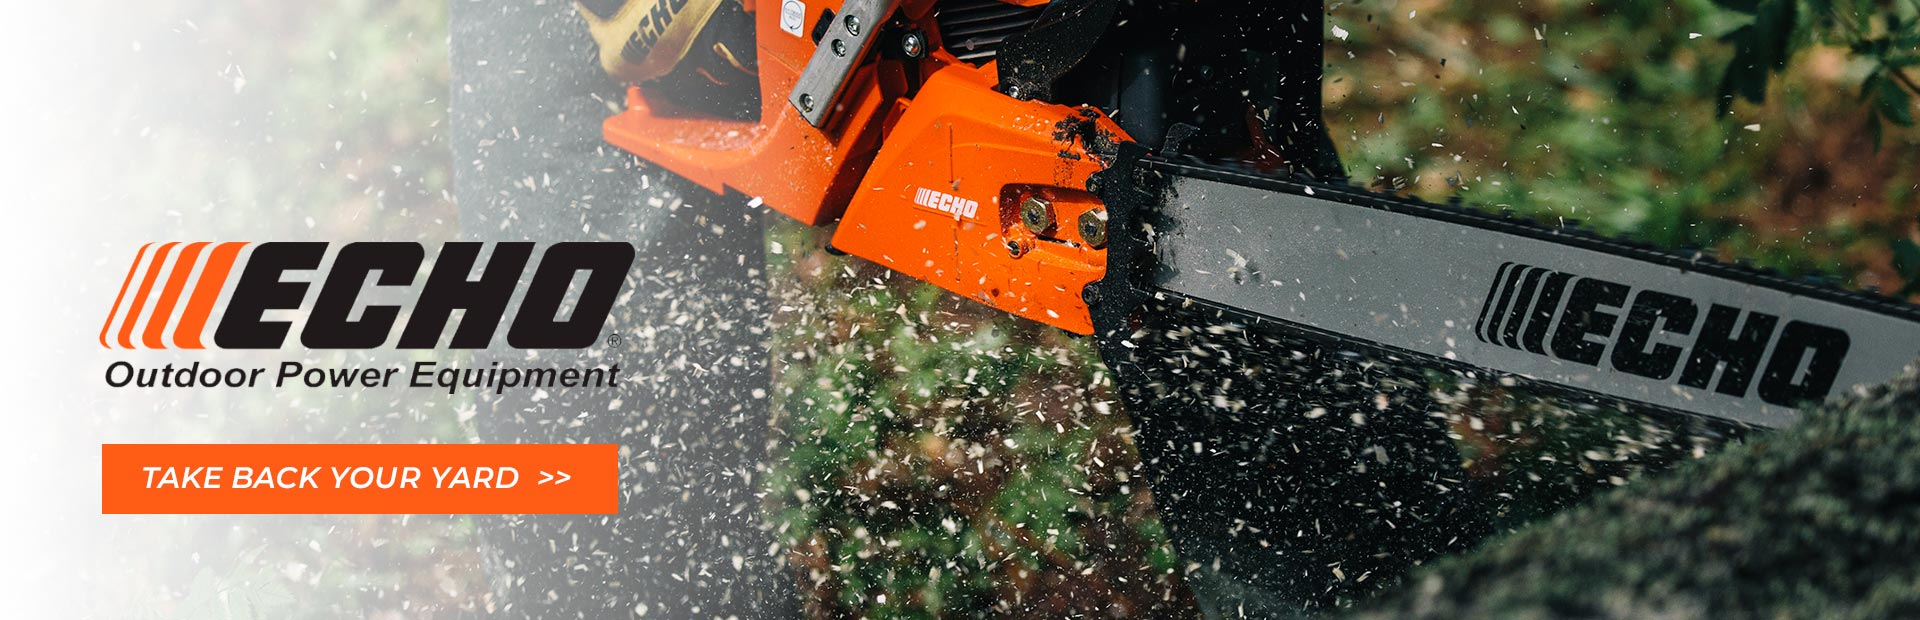 banner-echo-chainsaw-take-back-your-yard